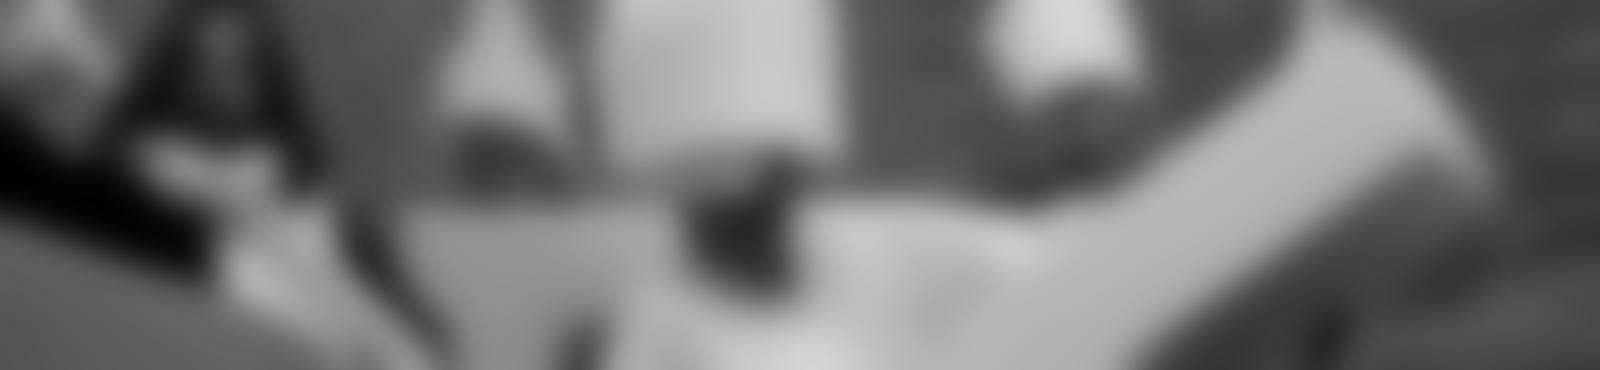 Blurred ff9c3afb dcb0 4956 a294 109f99b17424